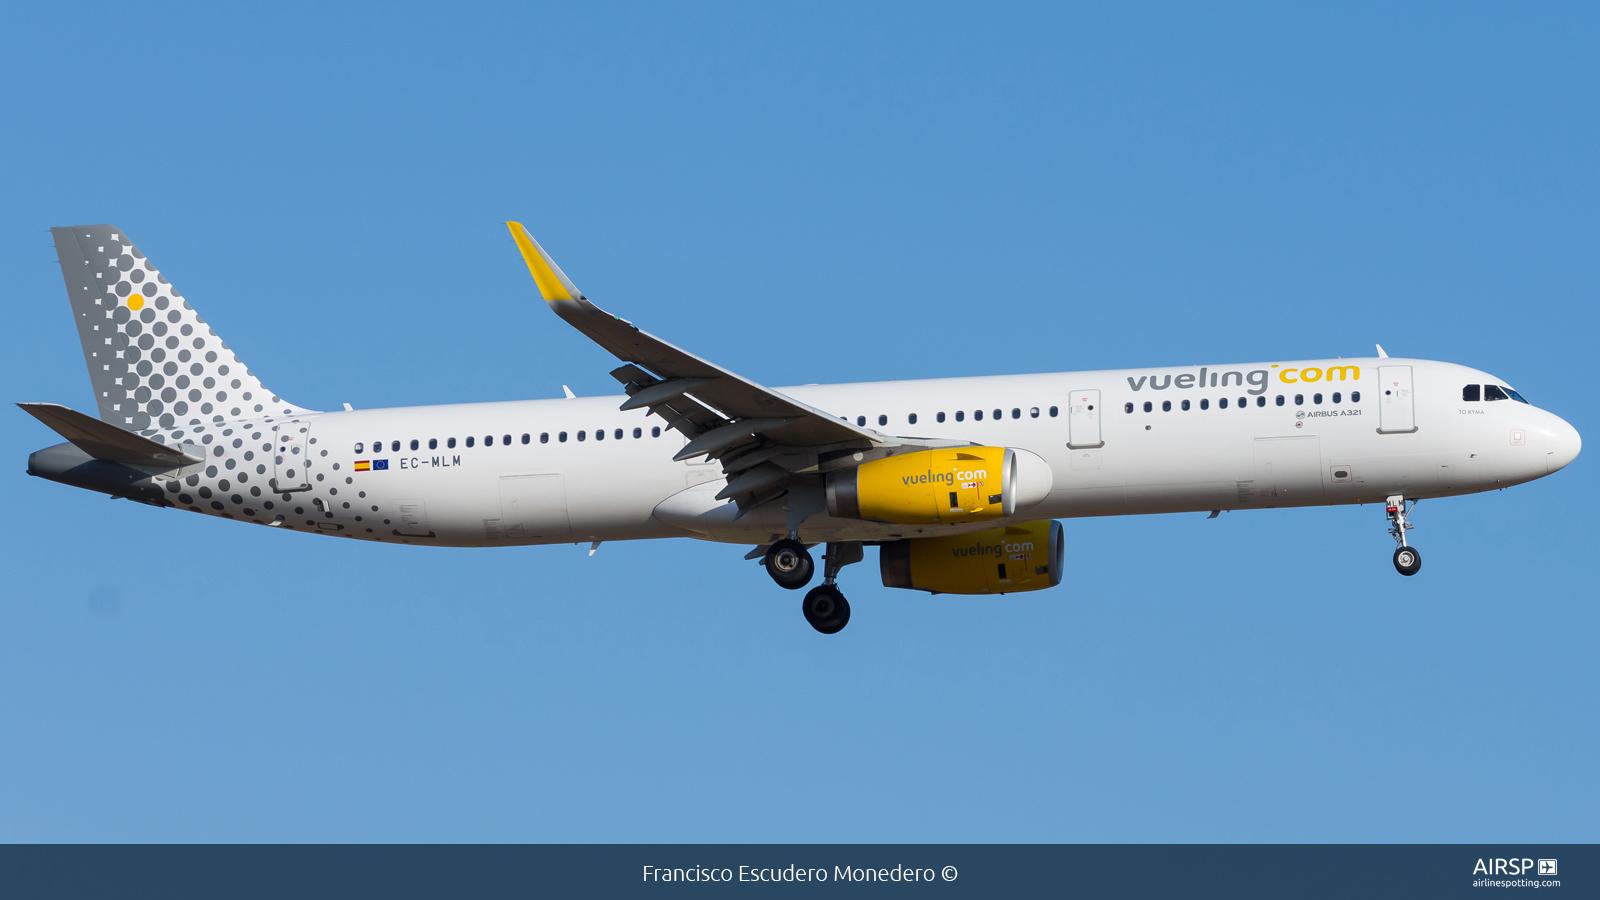 Vueling  Airbus A321  EC-MLM